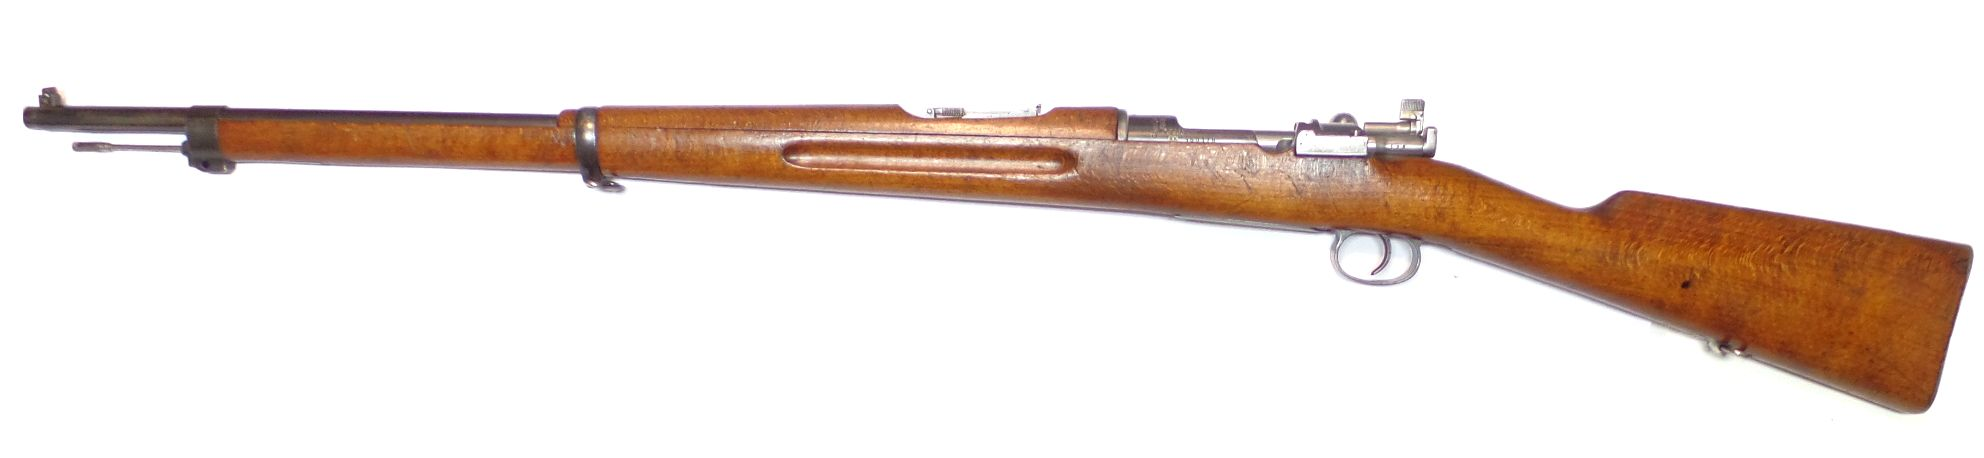 Carl Gustav M96 calibre 6.5x55